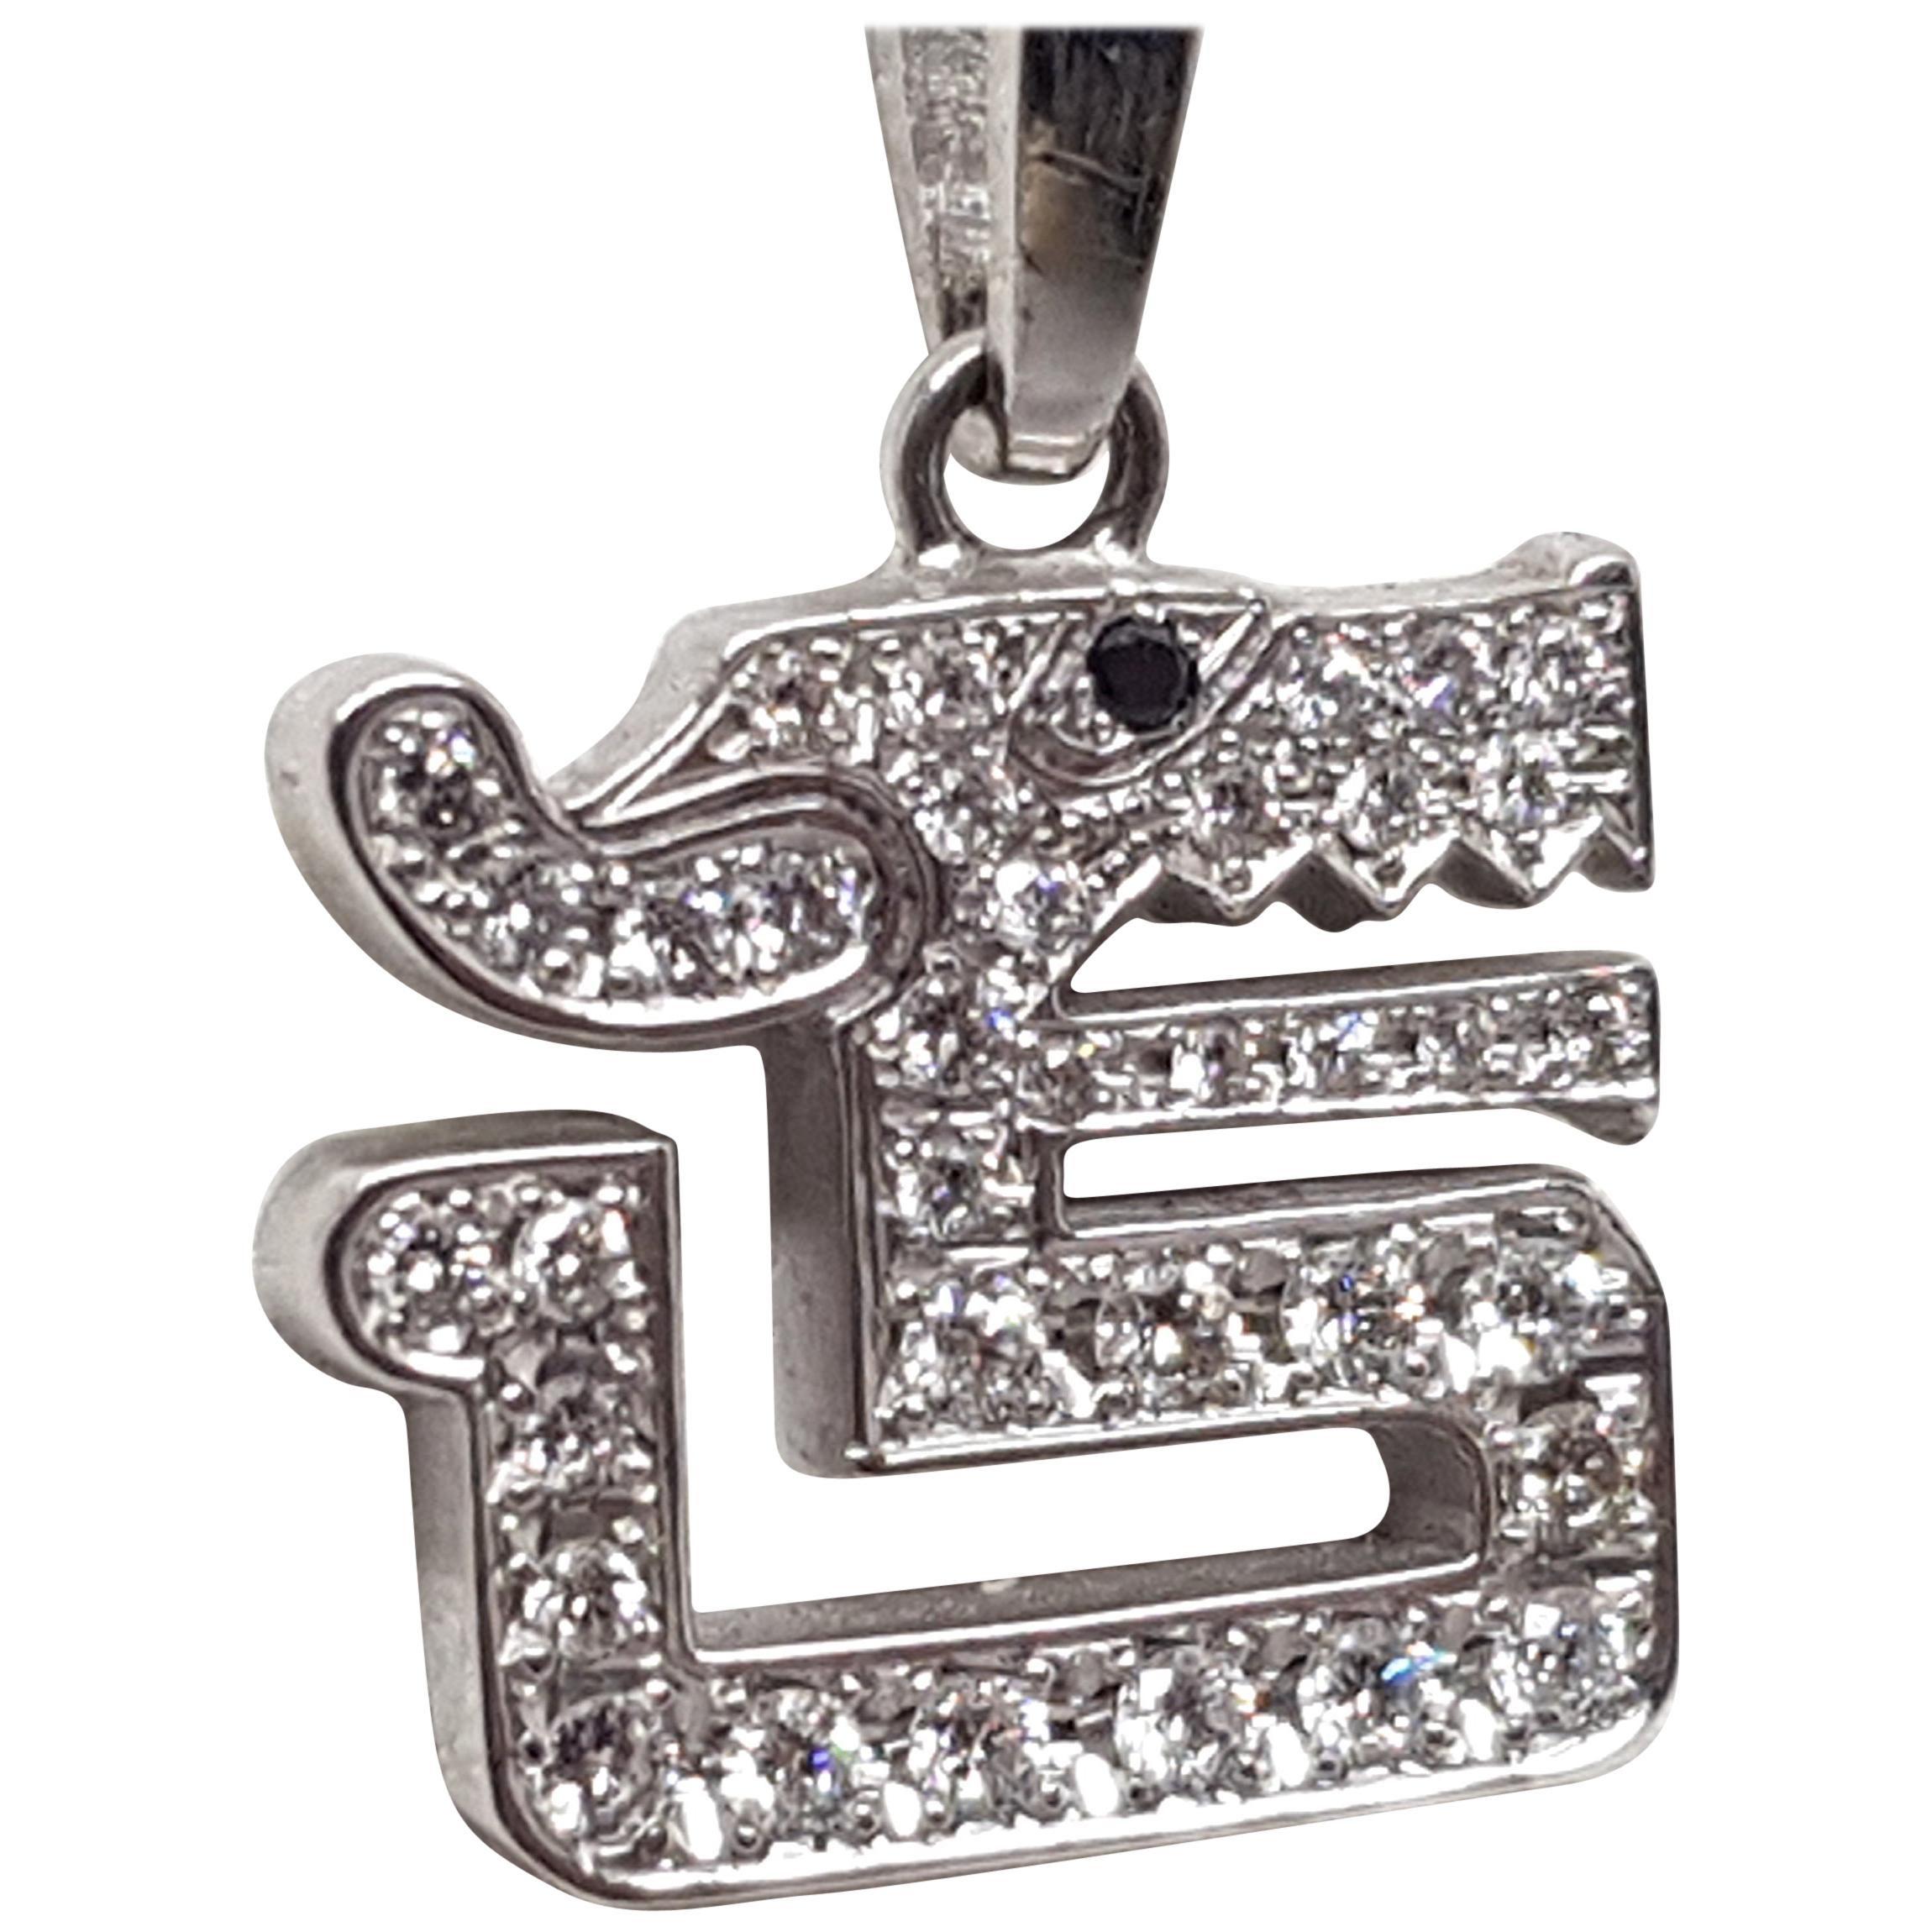 0.64 Carat White Gold Necklace Dragon Pendant